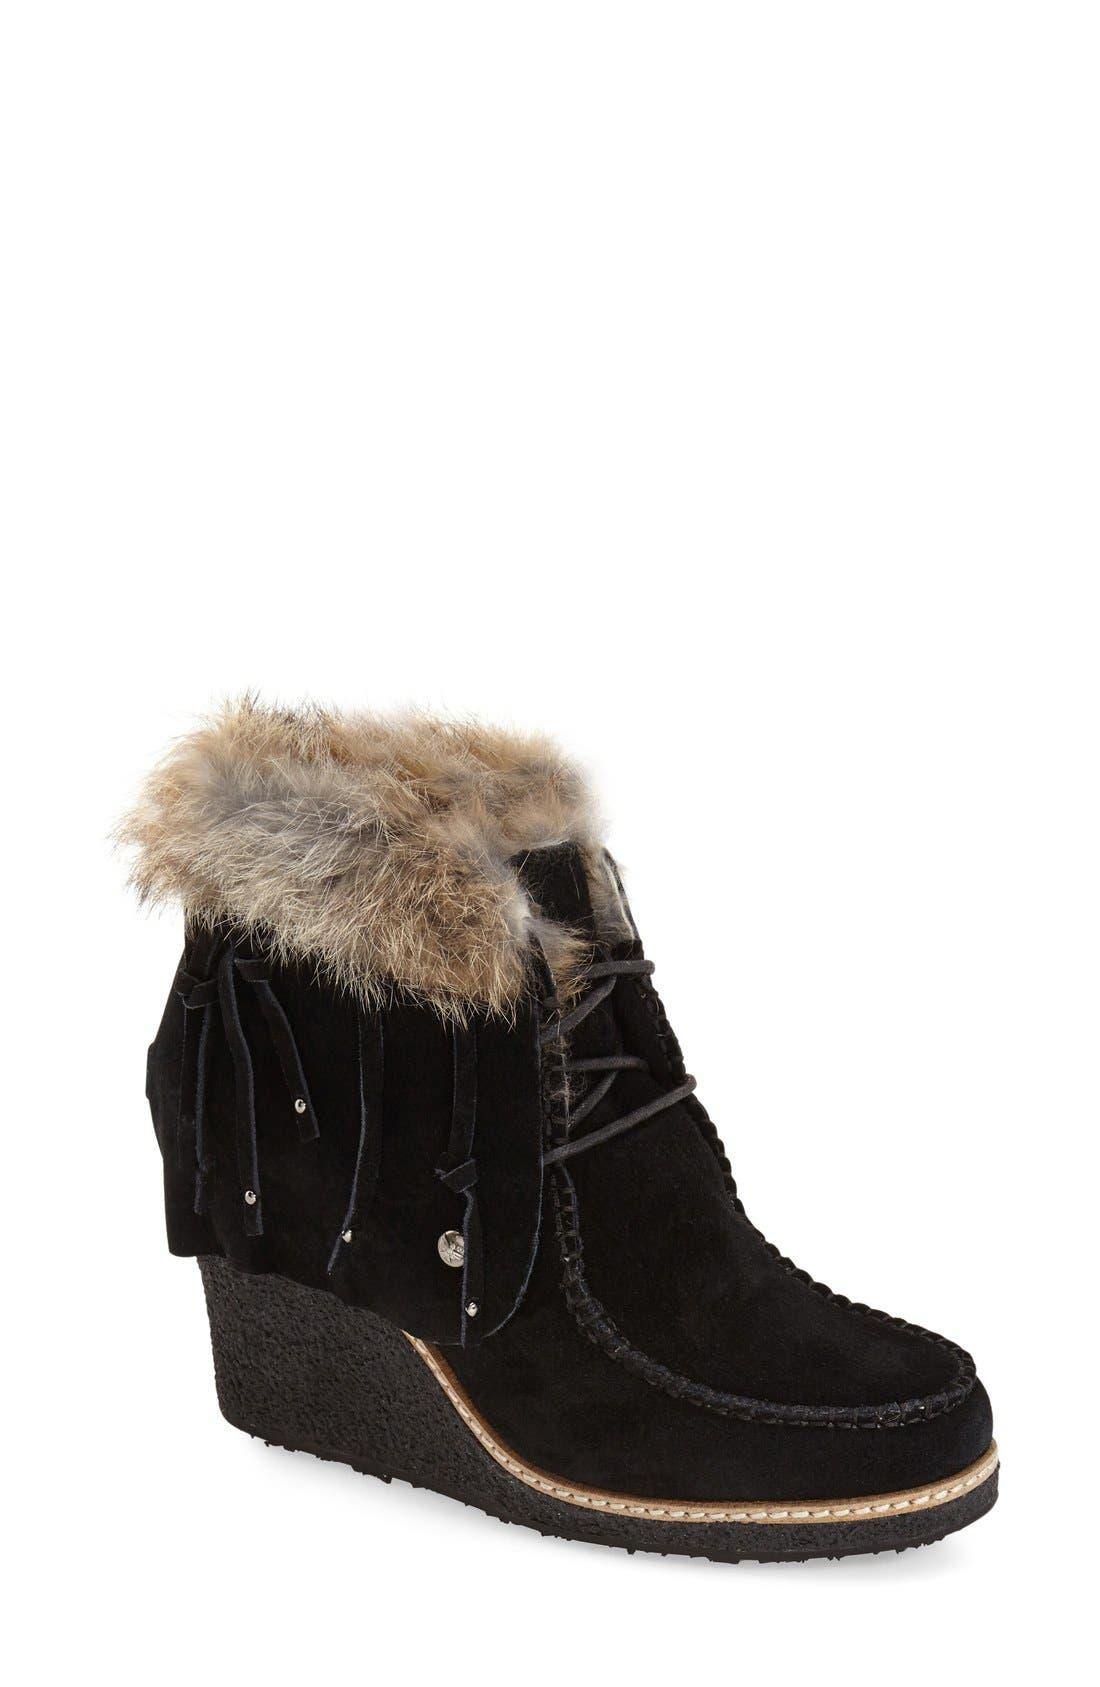 Main Image - Australia Luxe Collective 'Mantra' Genuine Shearling & Genuine Rabbit Fur Boot (Women)